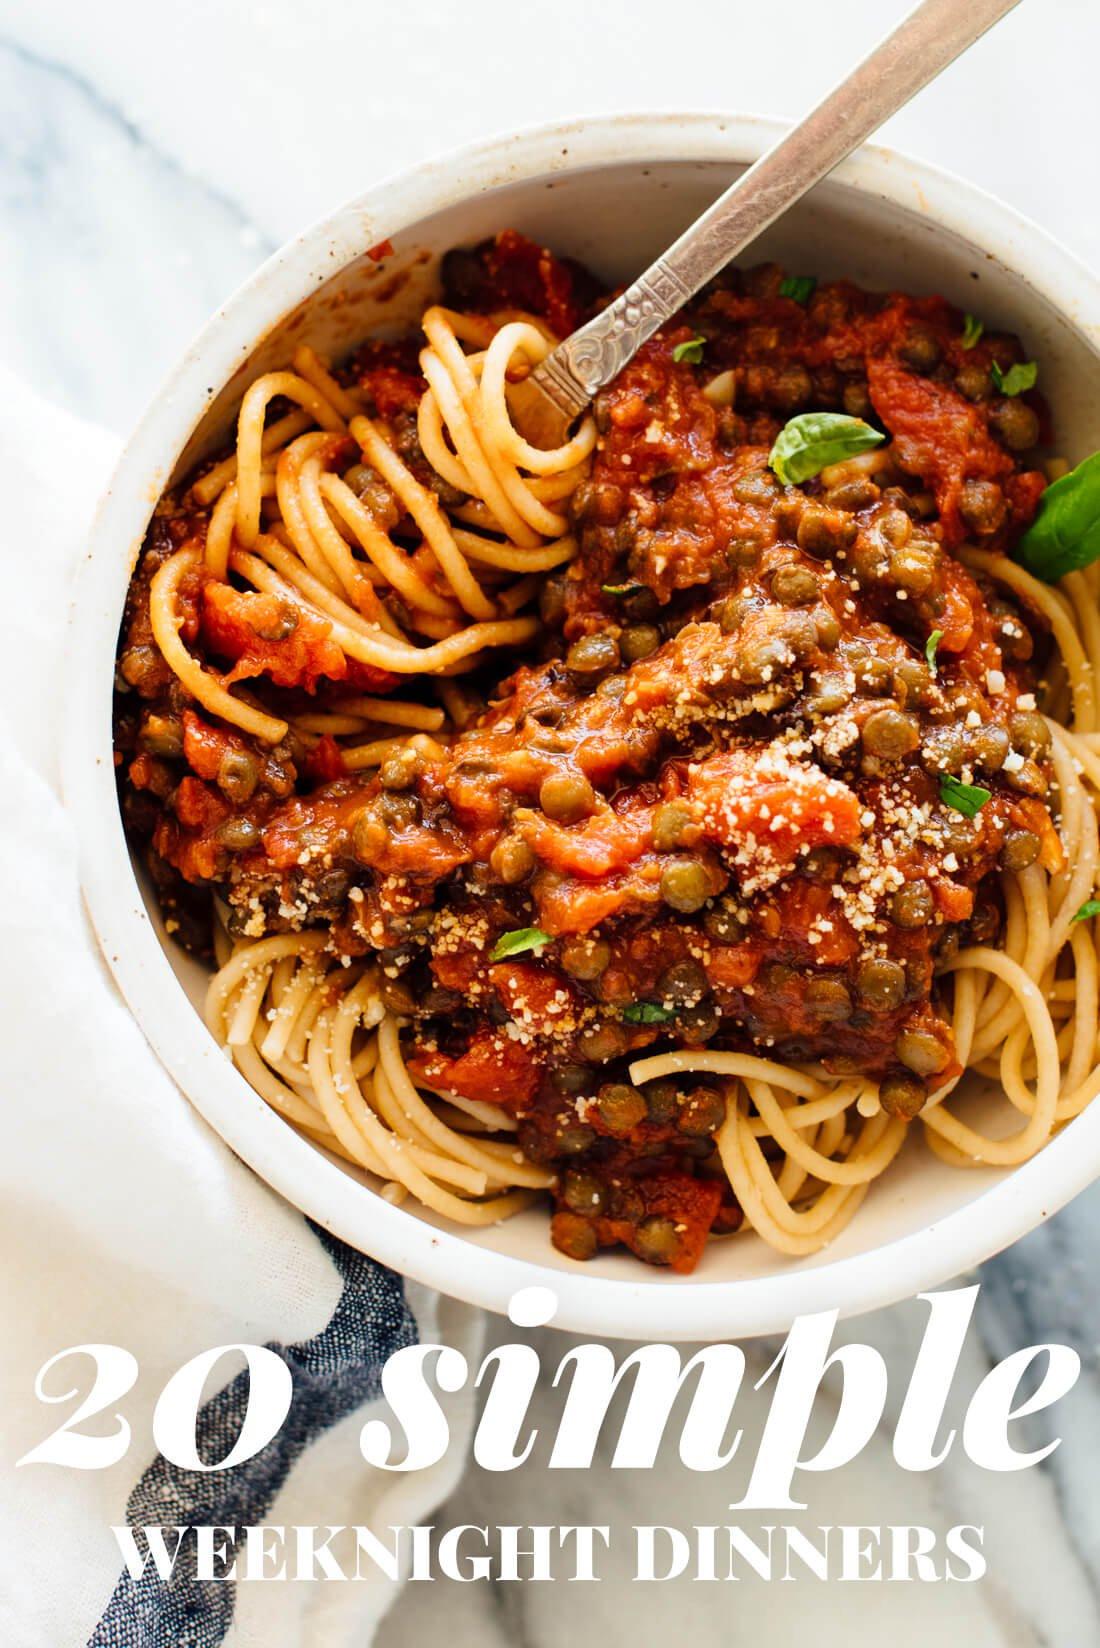 Healthy Vegan Dinners  20 Simple Ve arian Dinner Recipes Cookie and Kate